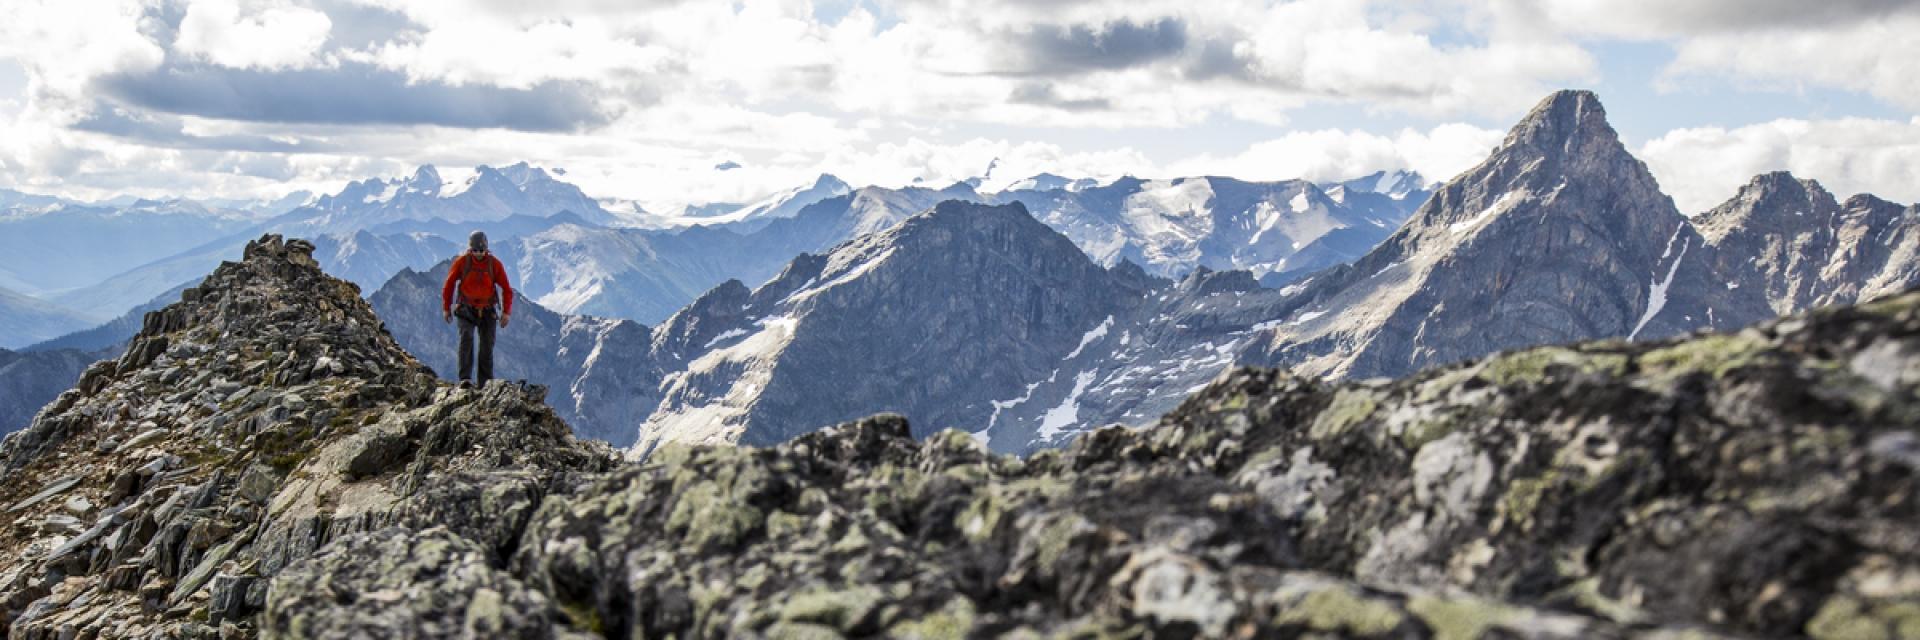 The Kootenay Rockies in British Columbia